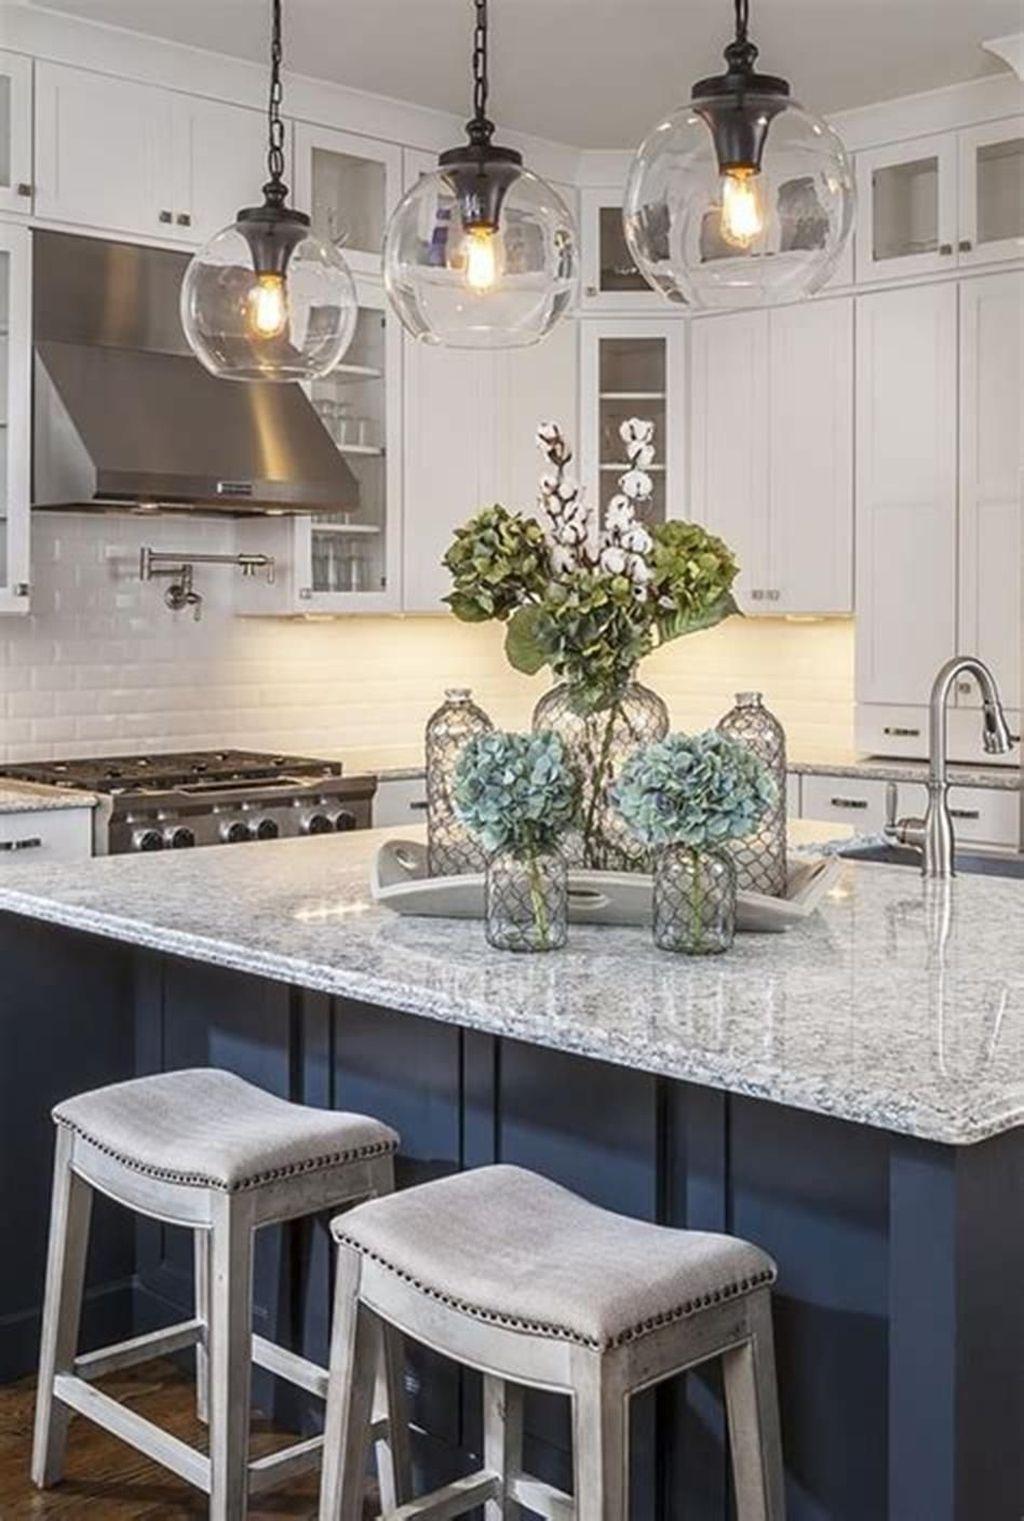 Wonderful Kitchen Lighting Ideas To Make It Look More Beautiful 15